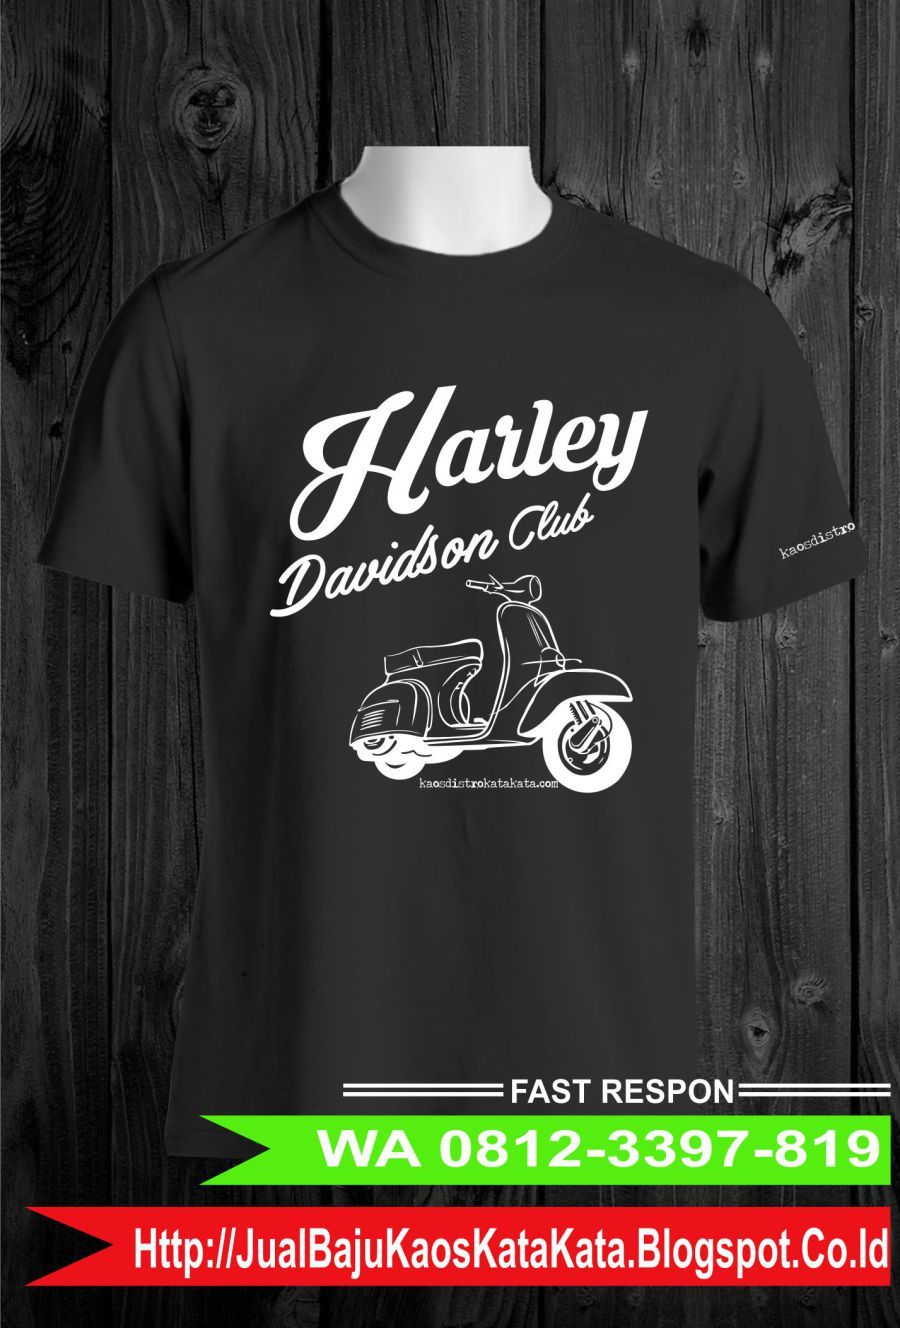 Pin By Kaos Kata Unik Keren Gaul Malang On 6wa 0812 3397 819 Polos Basic Cotton Couples Bandung Lacoste Dark Harley Davidson Ice Pops Couple Romantic